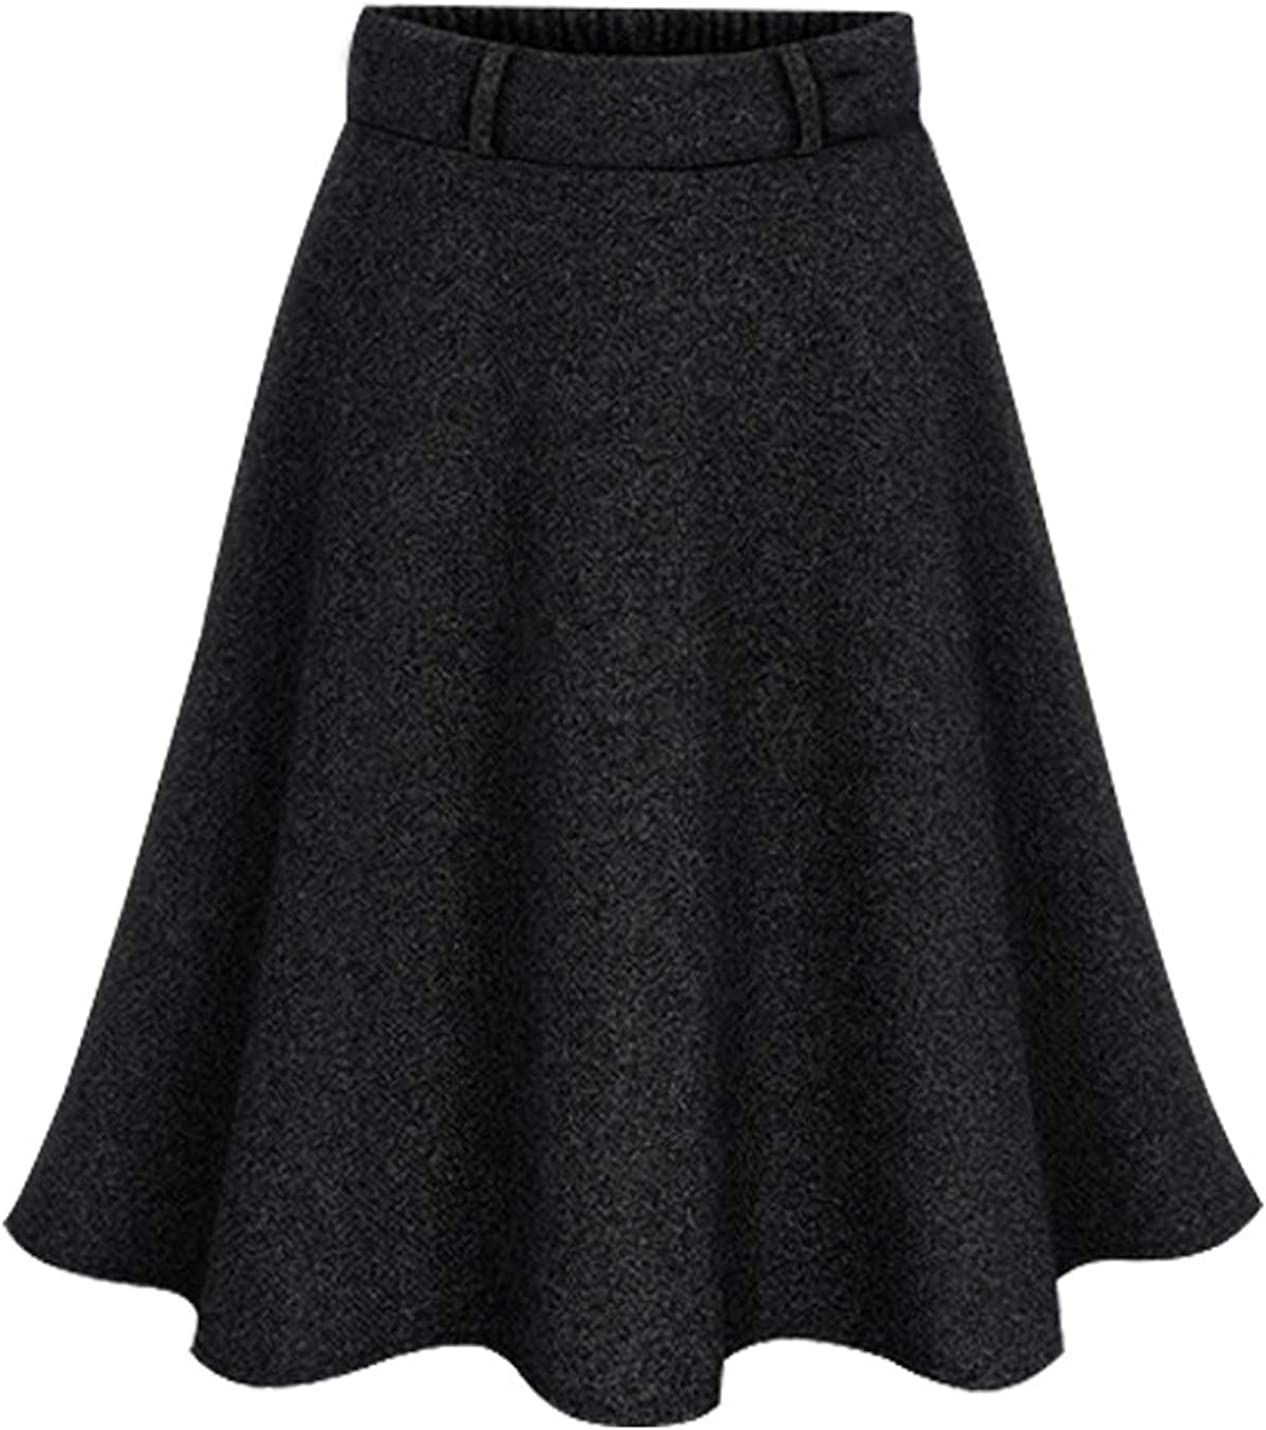 Flygo Women's Casual Elastic Waist Wool A-Line Flare Knee Length Skirt